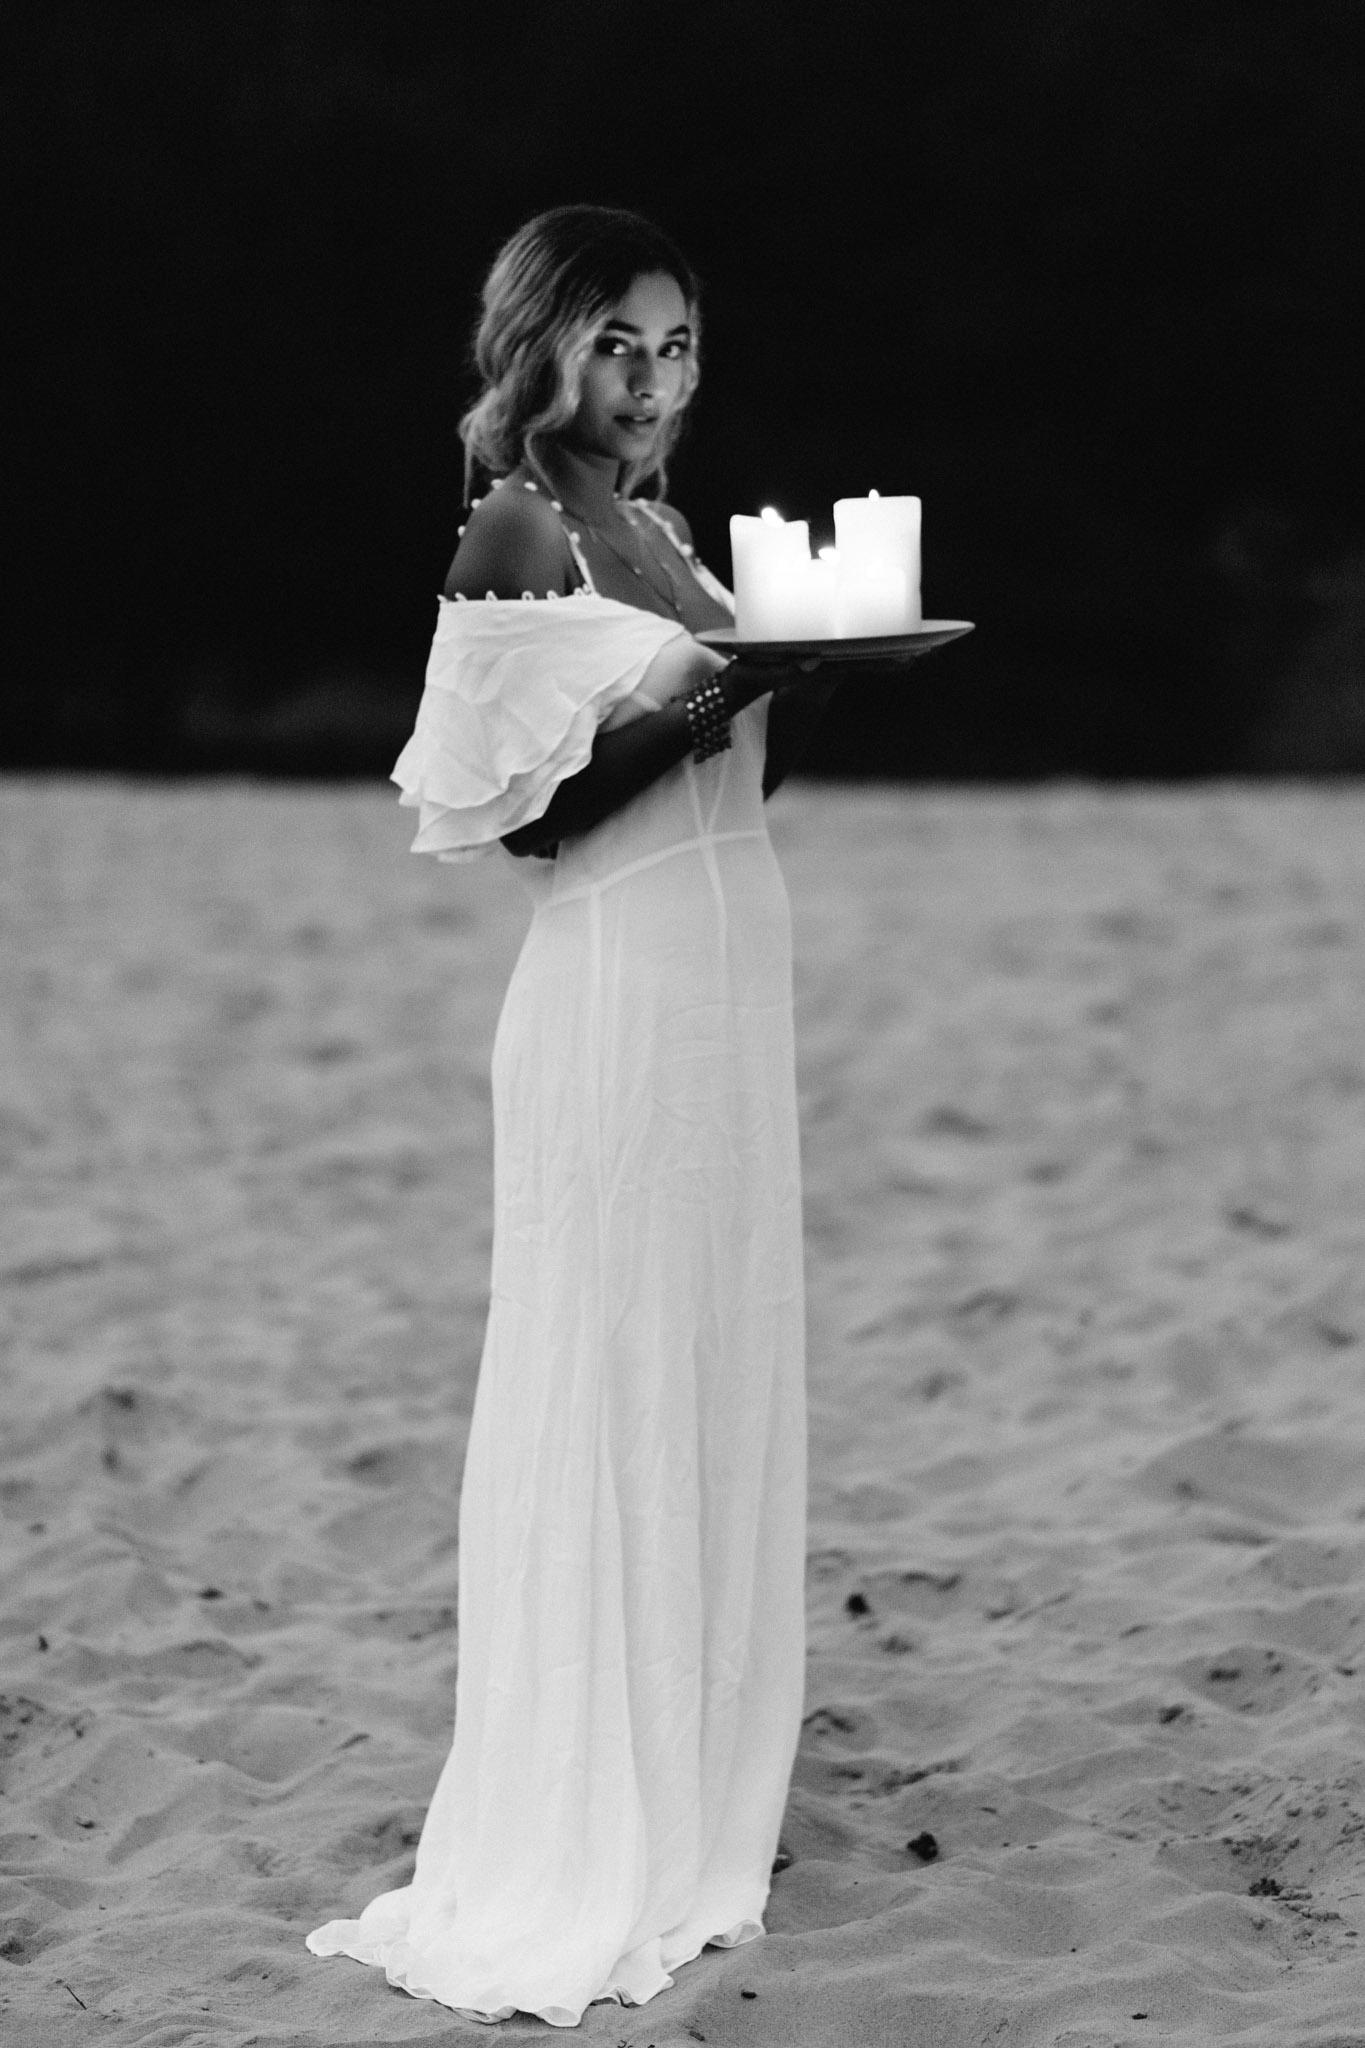 Speyer-Moroccan-Wedding-Inspiration-Pia-Anna-Christian-Wedding-Photography-S-81.jpg